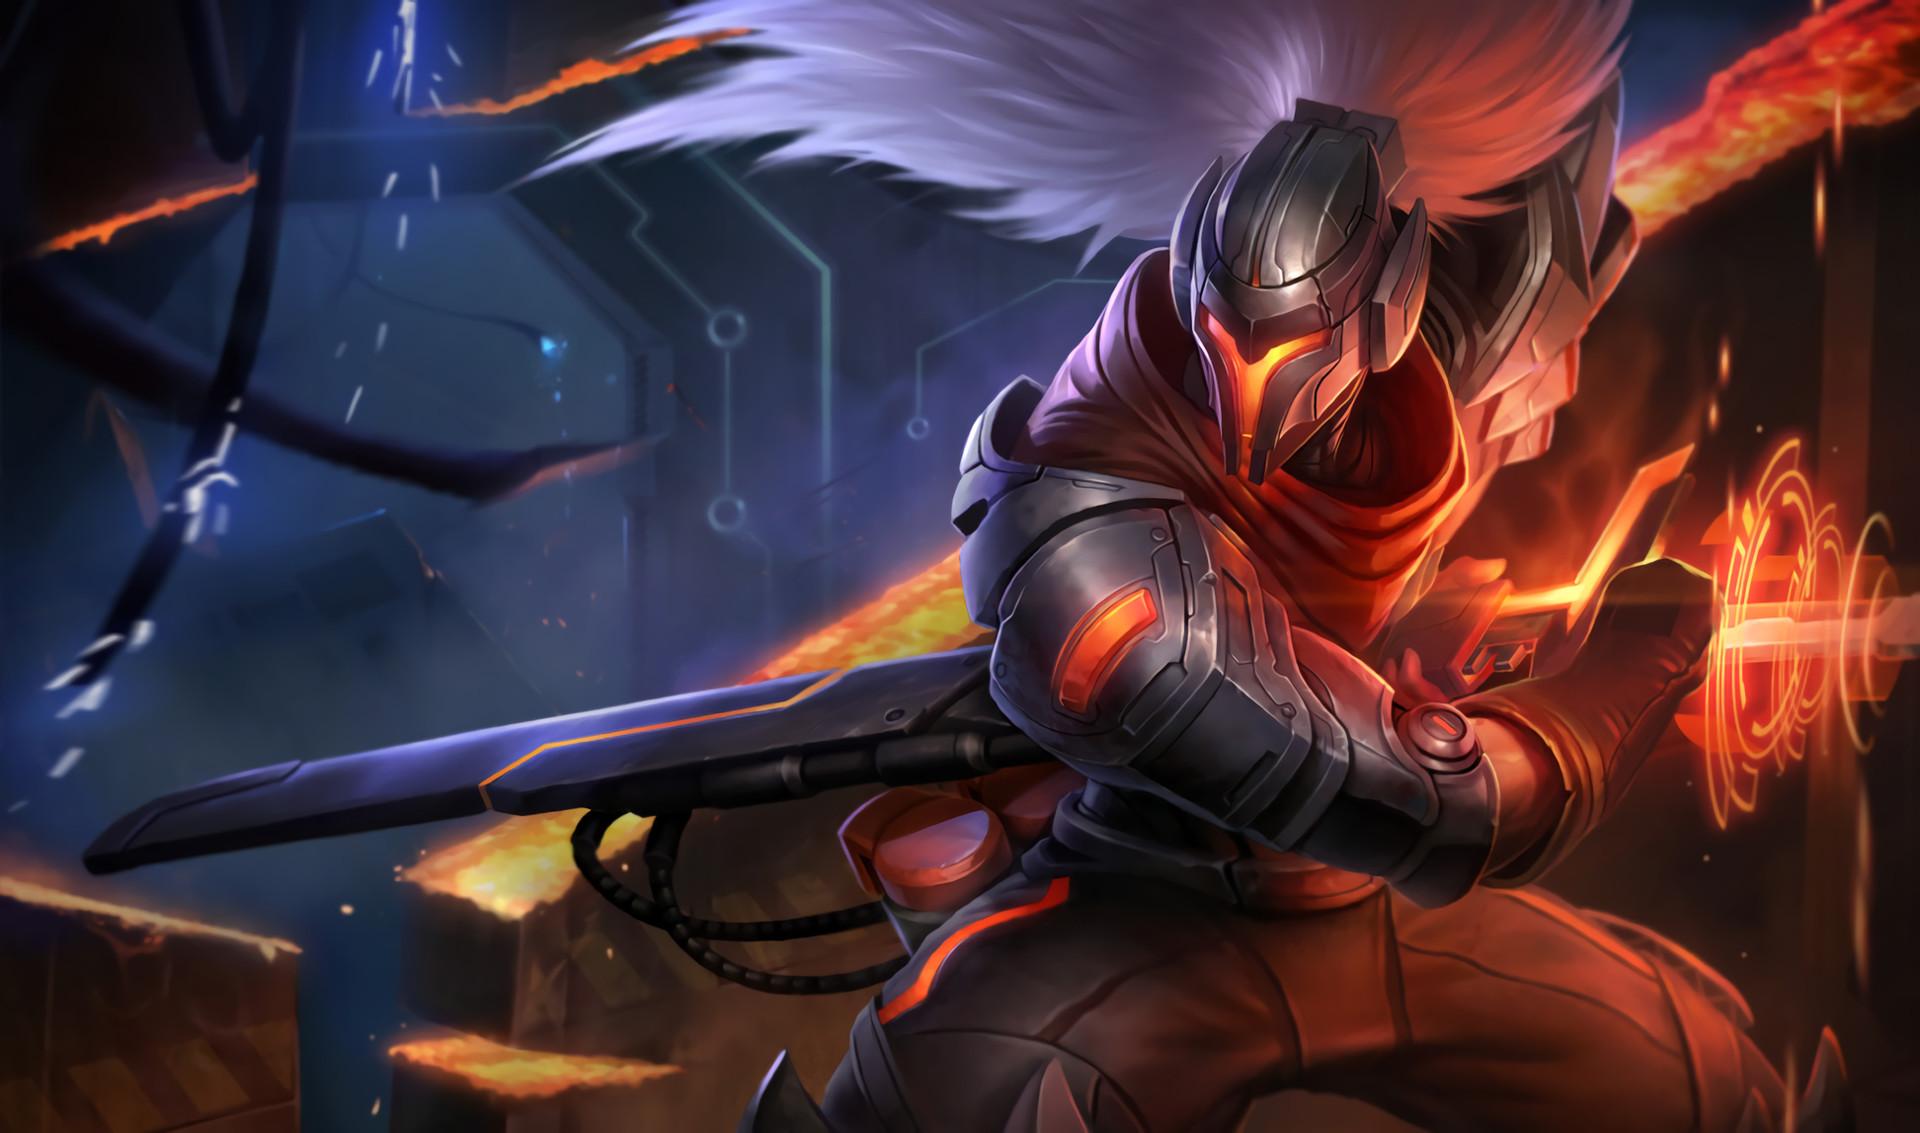 Video Game League Of Legends Yasuo (League Of Legends) Sword Wallpaper